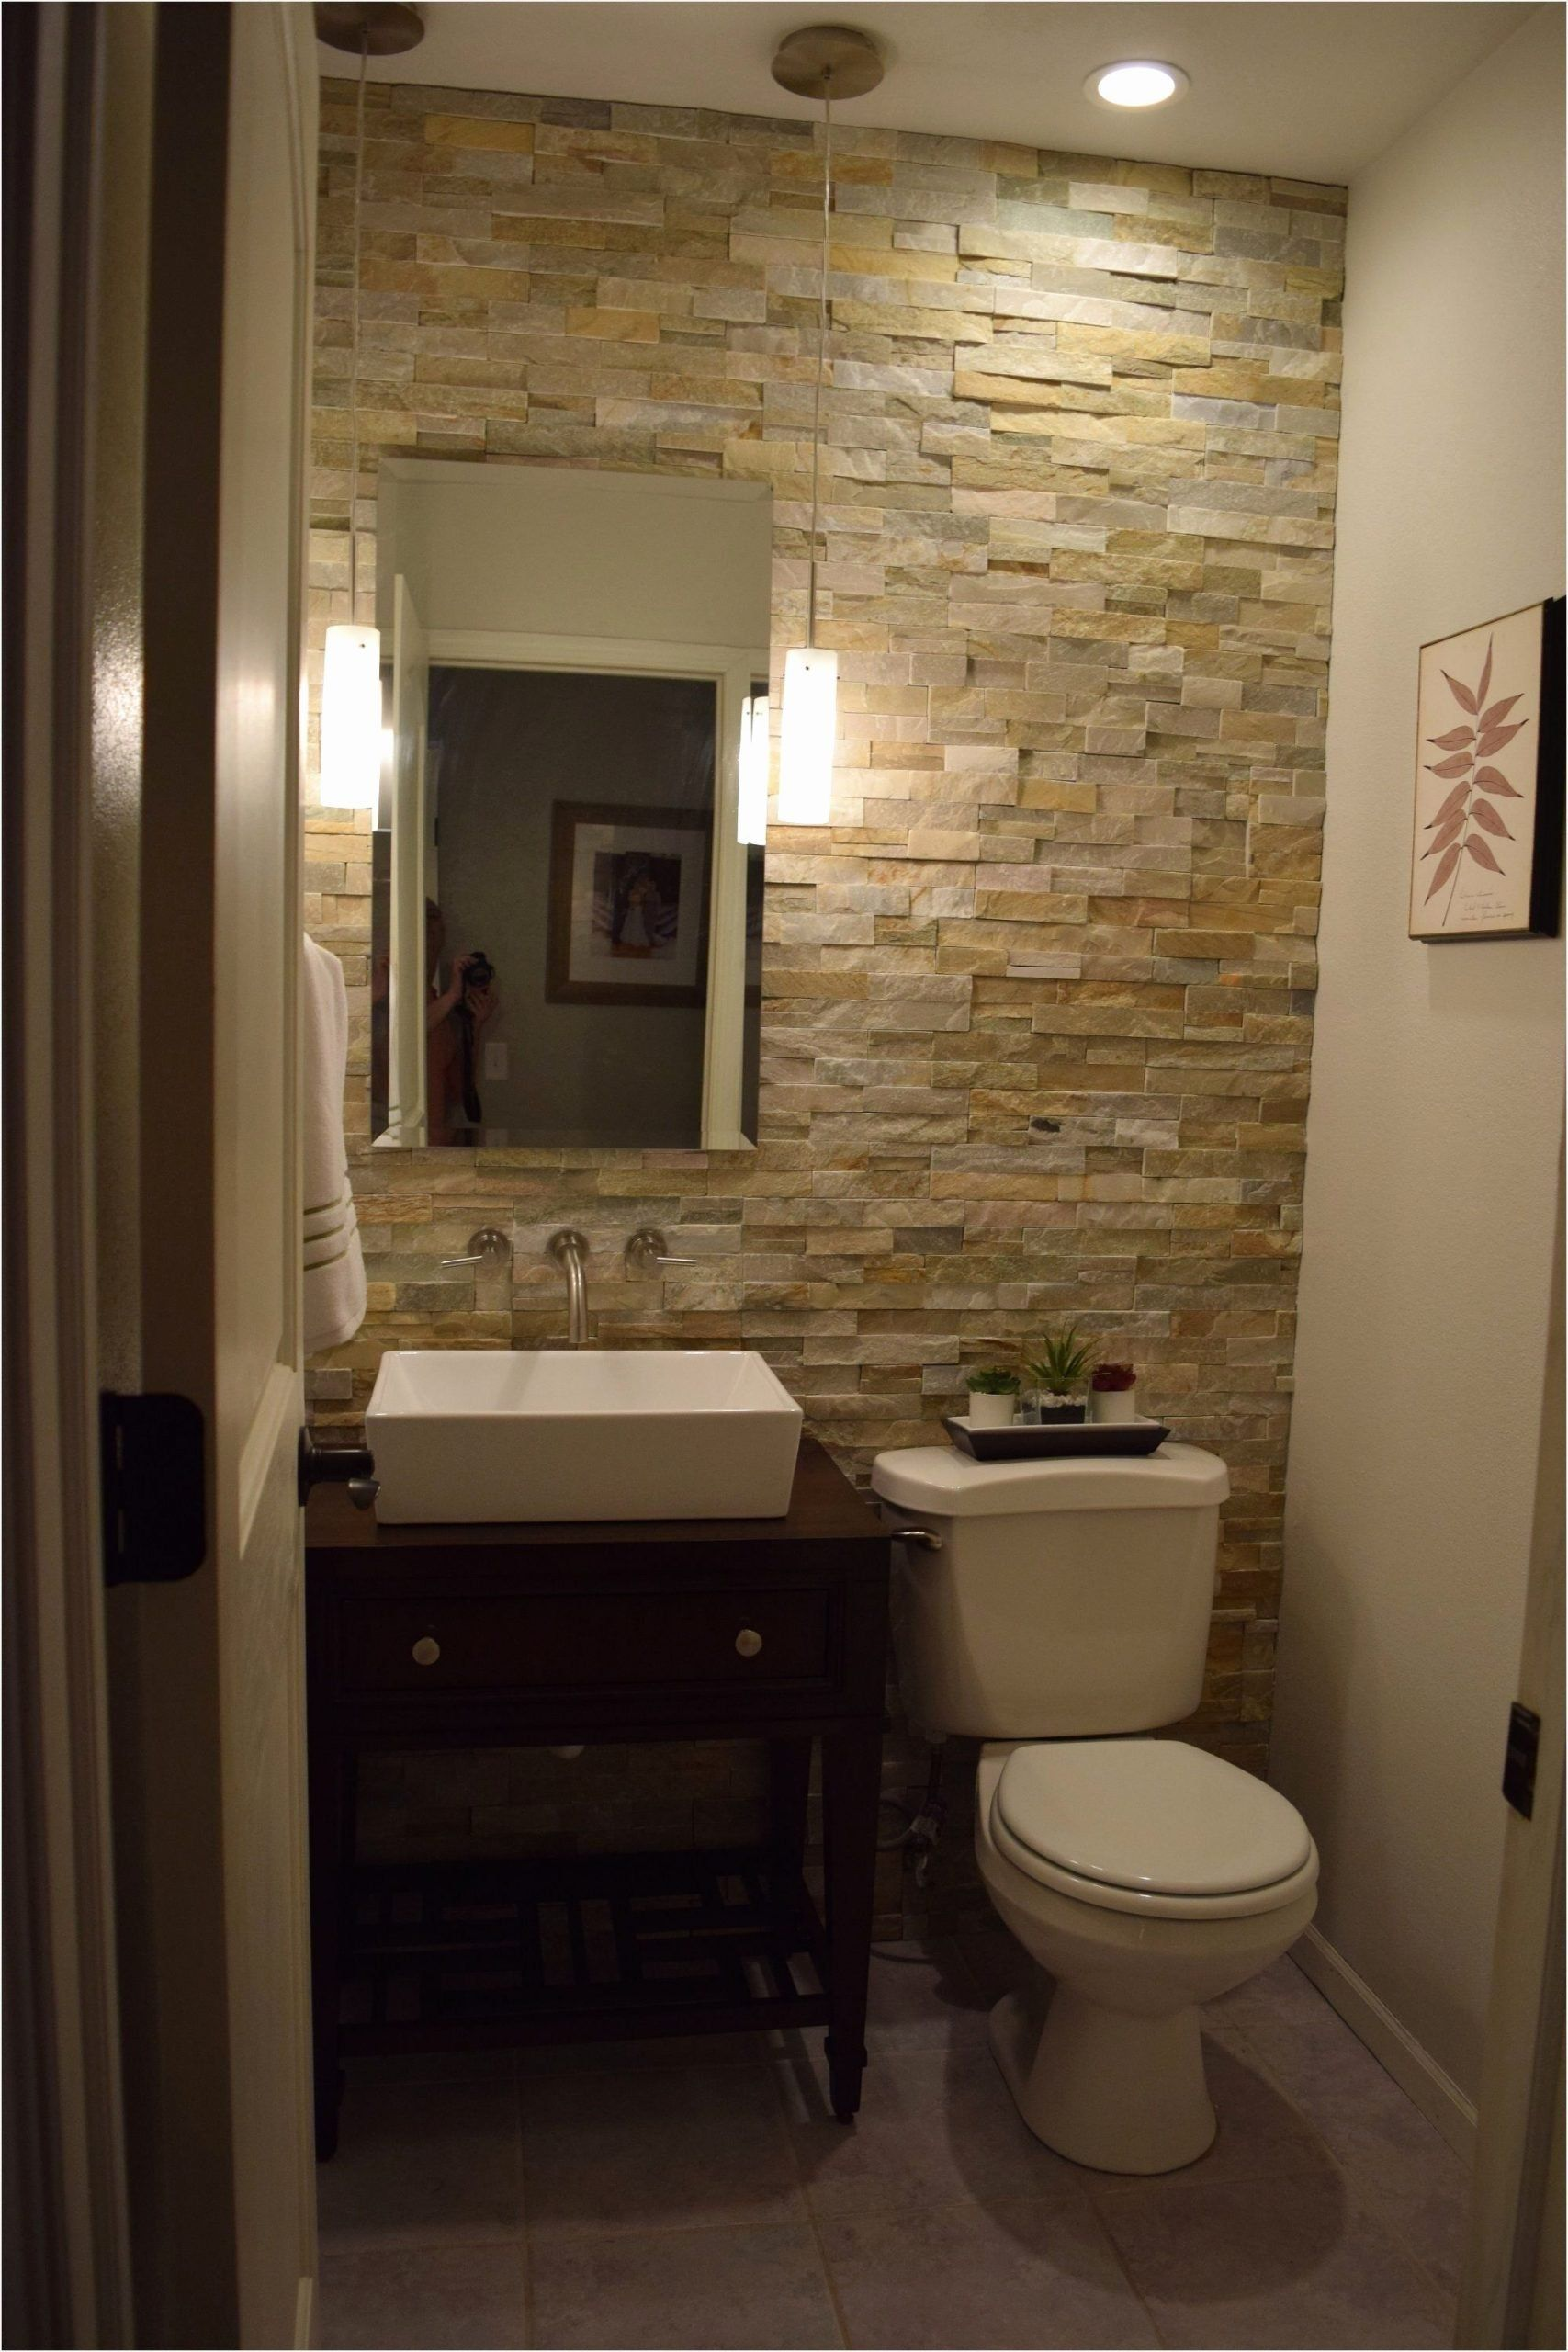 Very Small Half Bathroom Ideas Lovely Coastal Half Bath Remodel Ideas In 2020 In 2020 Small Half Bathrooms Modern Bathroom Remodel Half Bathroom